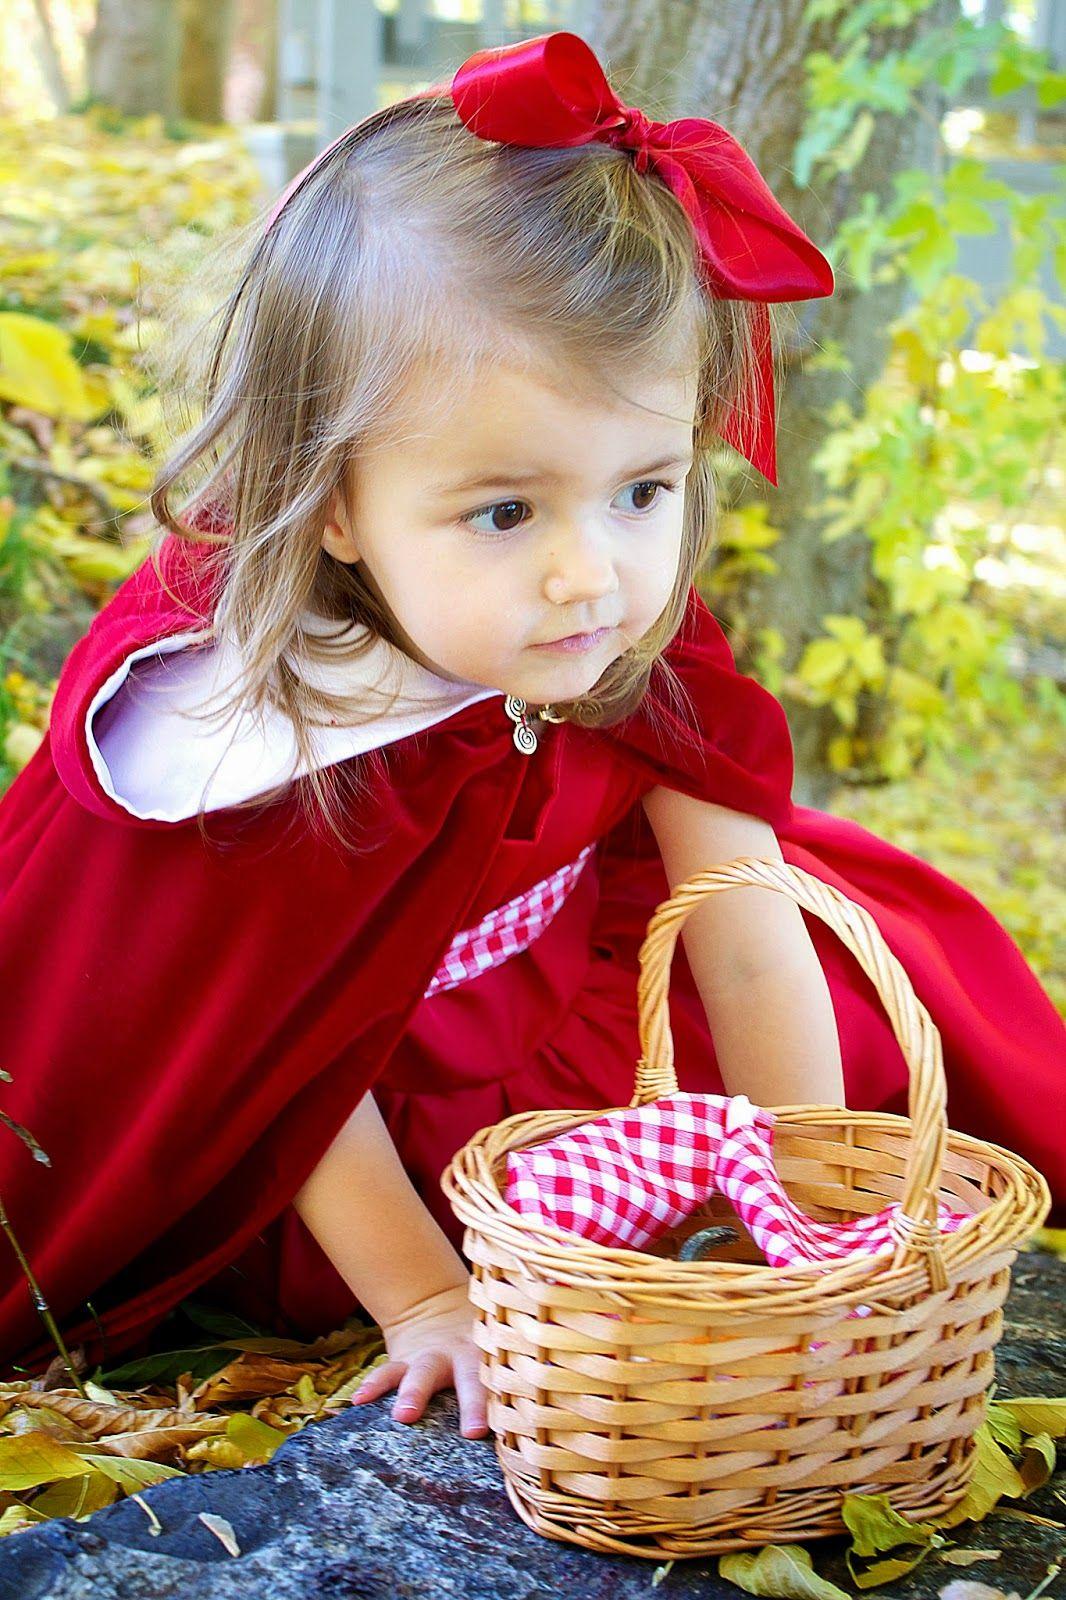 Diy little red riding hood costumecloak 2t 4t cloaks red riding do it yourself divas diy little red riding hood costumecloak 2t toddler halloween solutioingenieria Images